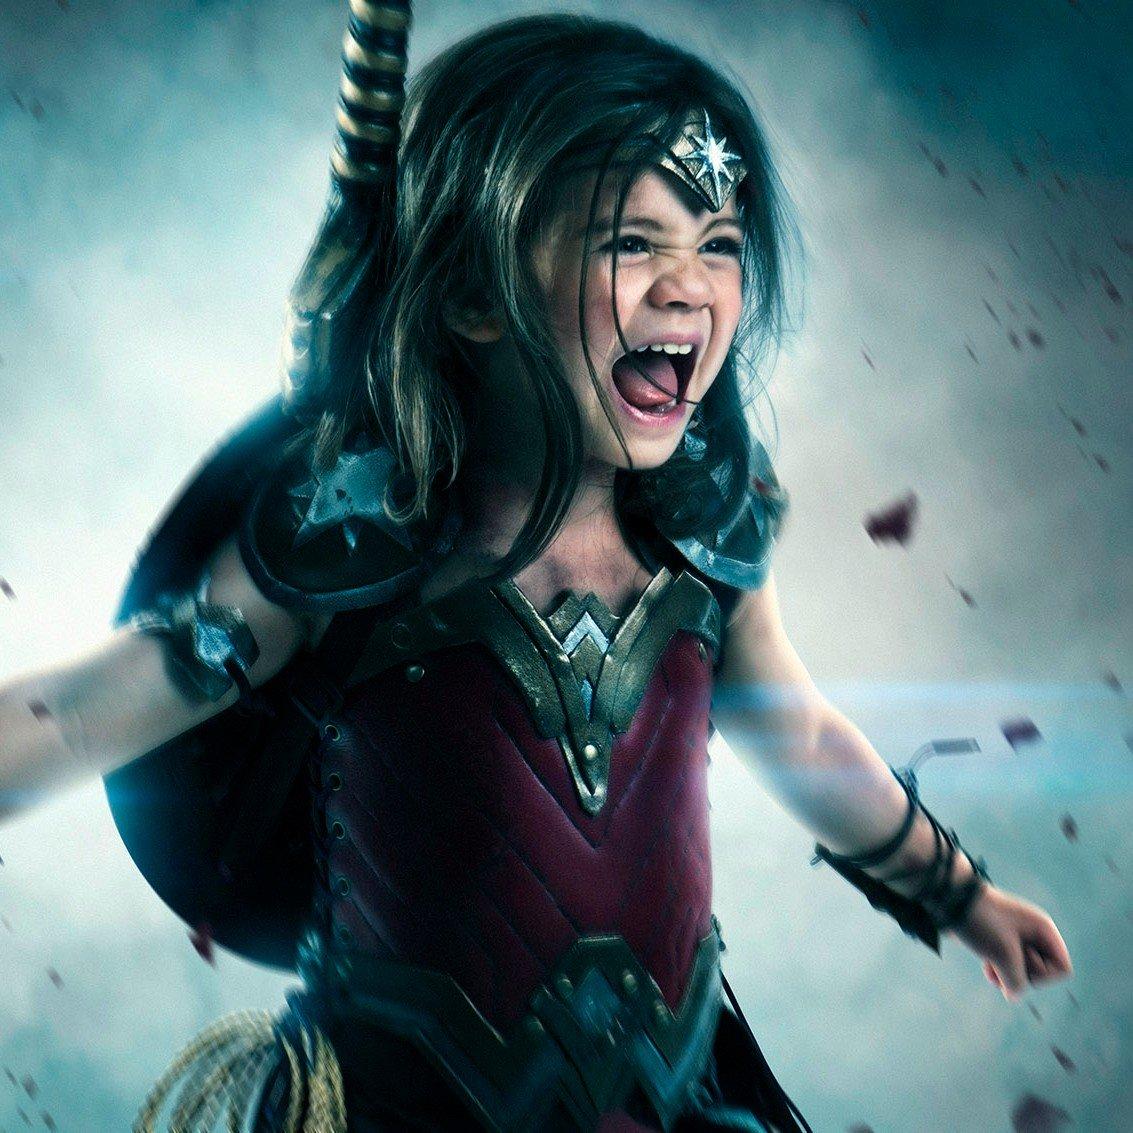 Little-Girl-Wonder-Woman-Cosplay